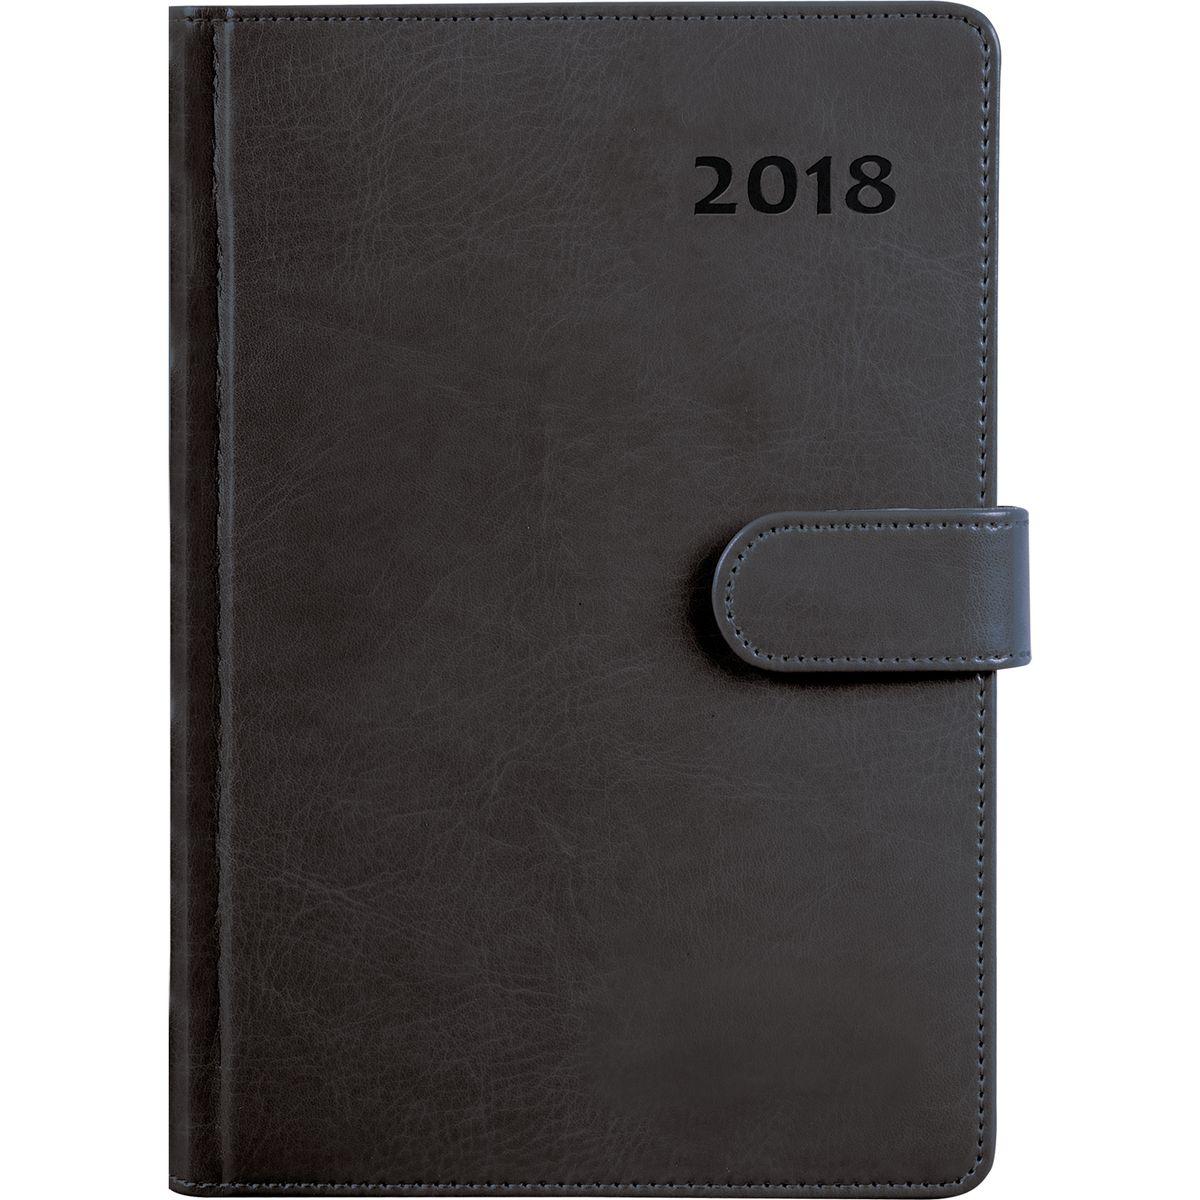 Galant Ежедневник датированный Ritter 2018 формат А5 цвет черный ritter одежда для мужчин